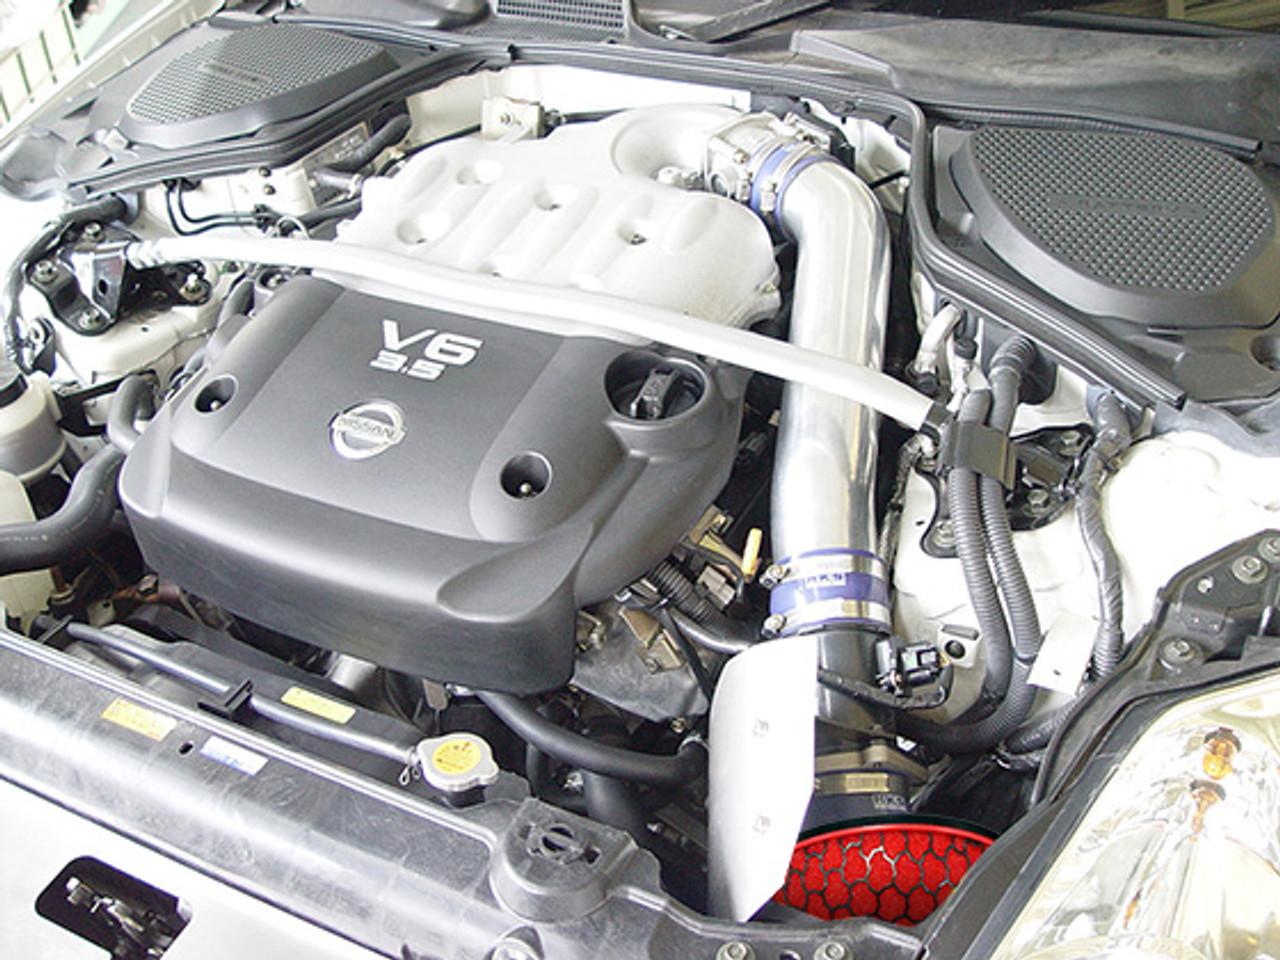 HKS Racing Suction Kit for Nissan 350z on nissan 350z shifter knob, nissan 350z thermostat, nissan 350z gear knob, nissan d21 fuel filter, nissan tiida fuel filter, nissan cube fuel filter, nissan 350z throttle body, nissan armada fuel filter, nissan 350z ball joint, nissan 350z exhaust tip, nissan 350z timing chain, nissan 350z window regulator, nissan 350z control arm, nissan 350z voltage regulator, nissan 350z mud flaps, nissan 350z jack points, nissan 350z tune up, nissan 350z camshaft sensor, nissan 350z trunk mat, nissan 350z carburetor,